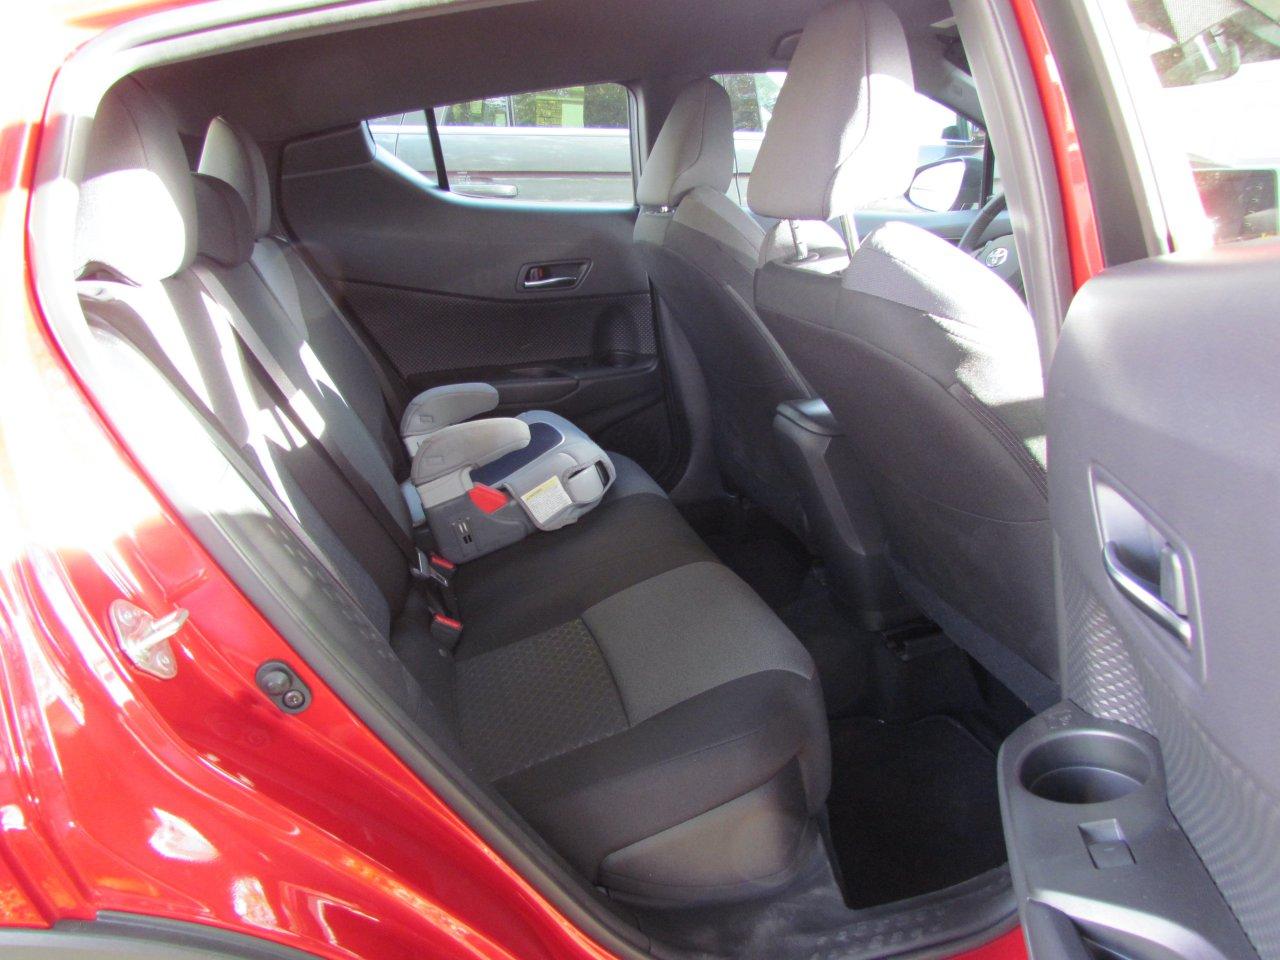 C-HR, Driven: Toyota's C-HR has some delightful details, ClassicCars.com Journal